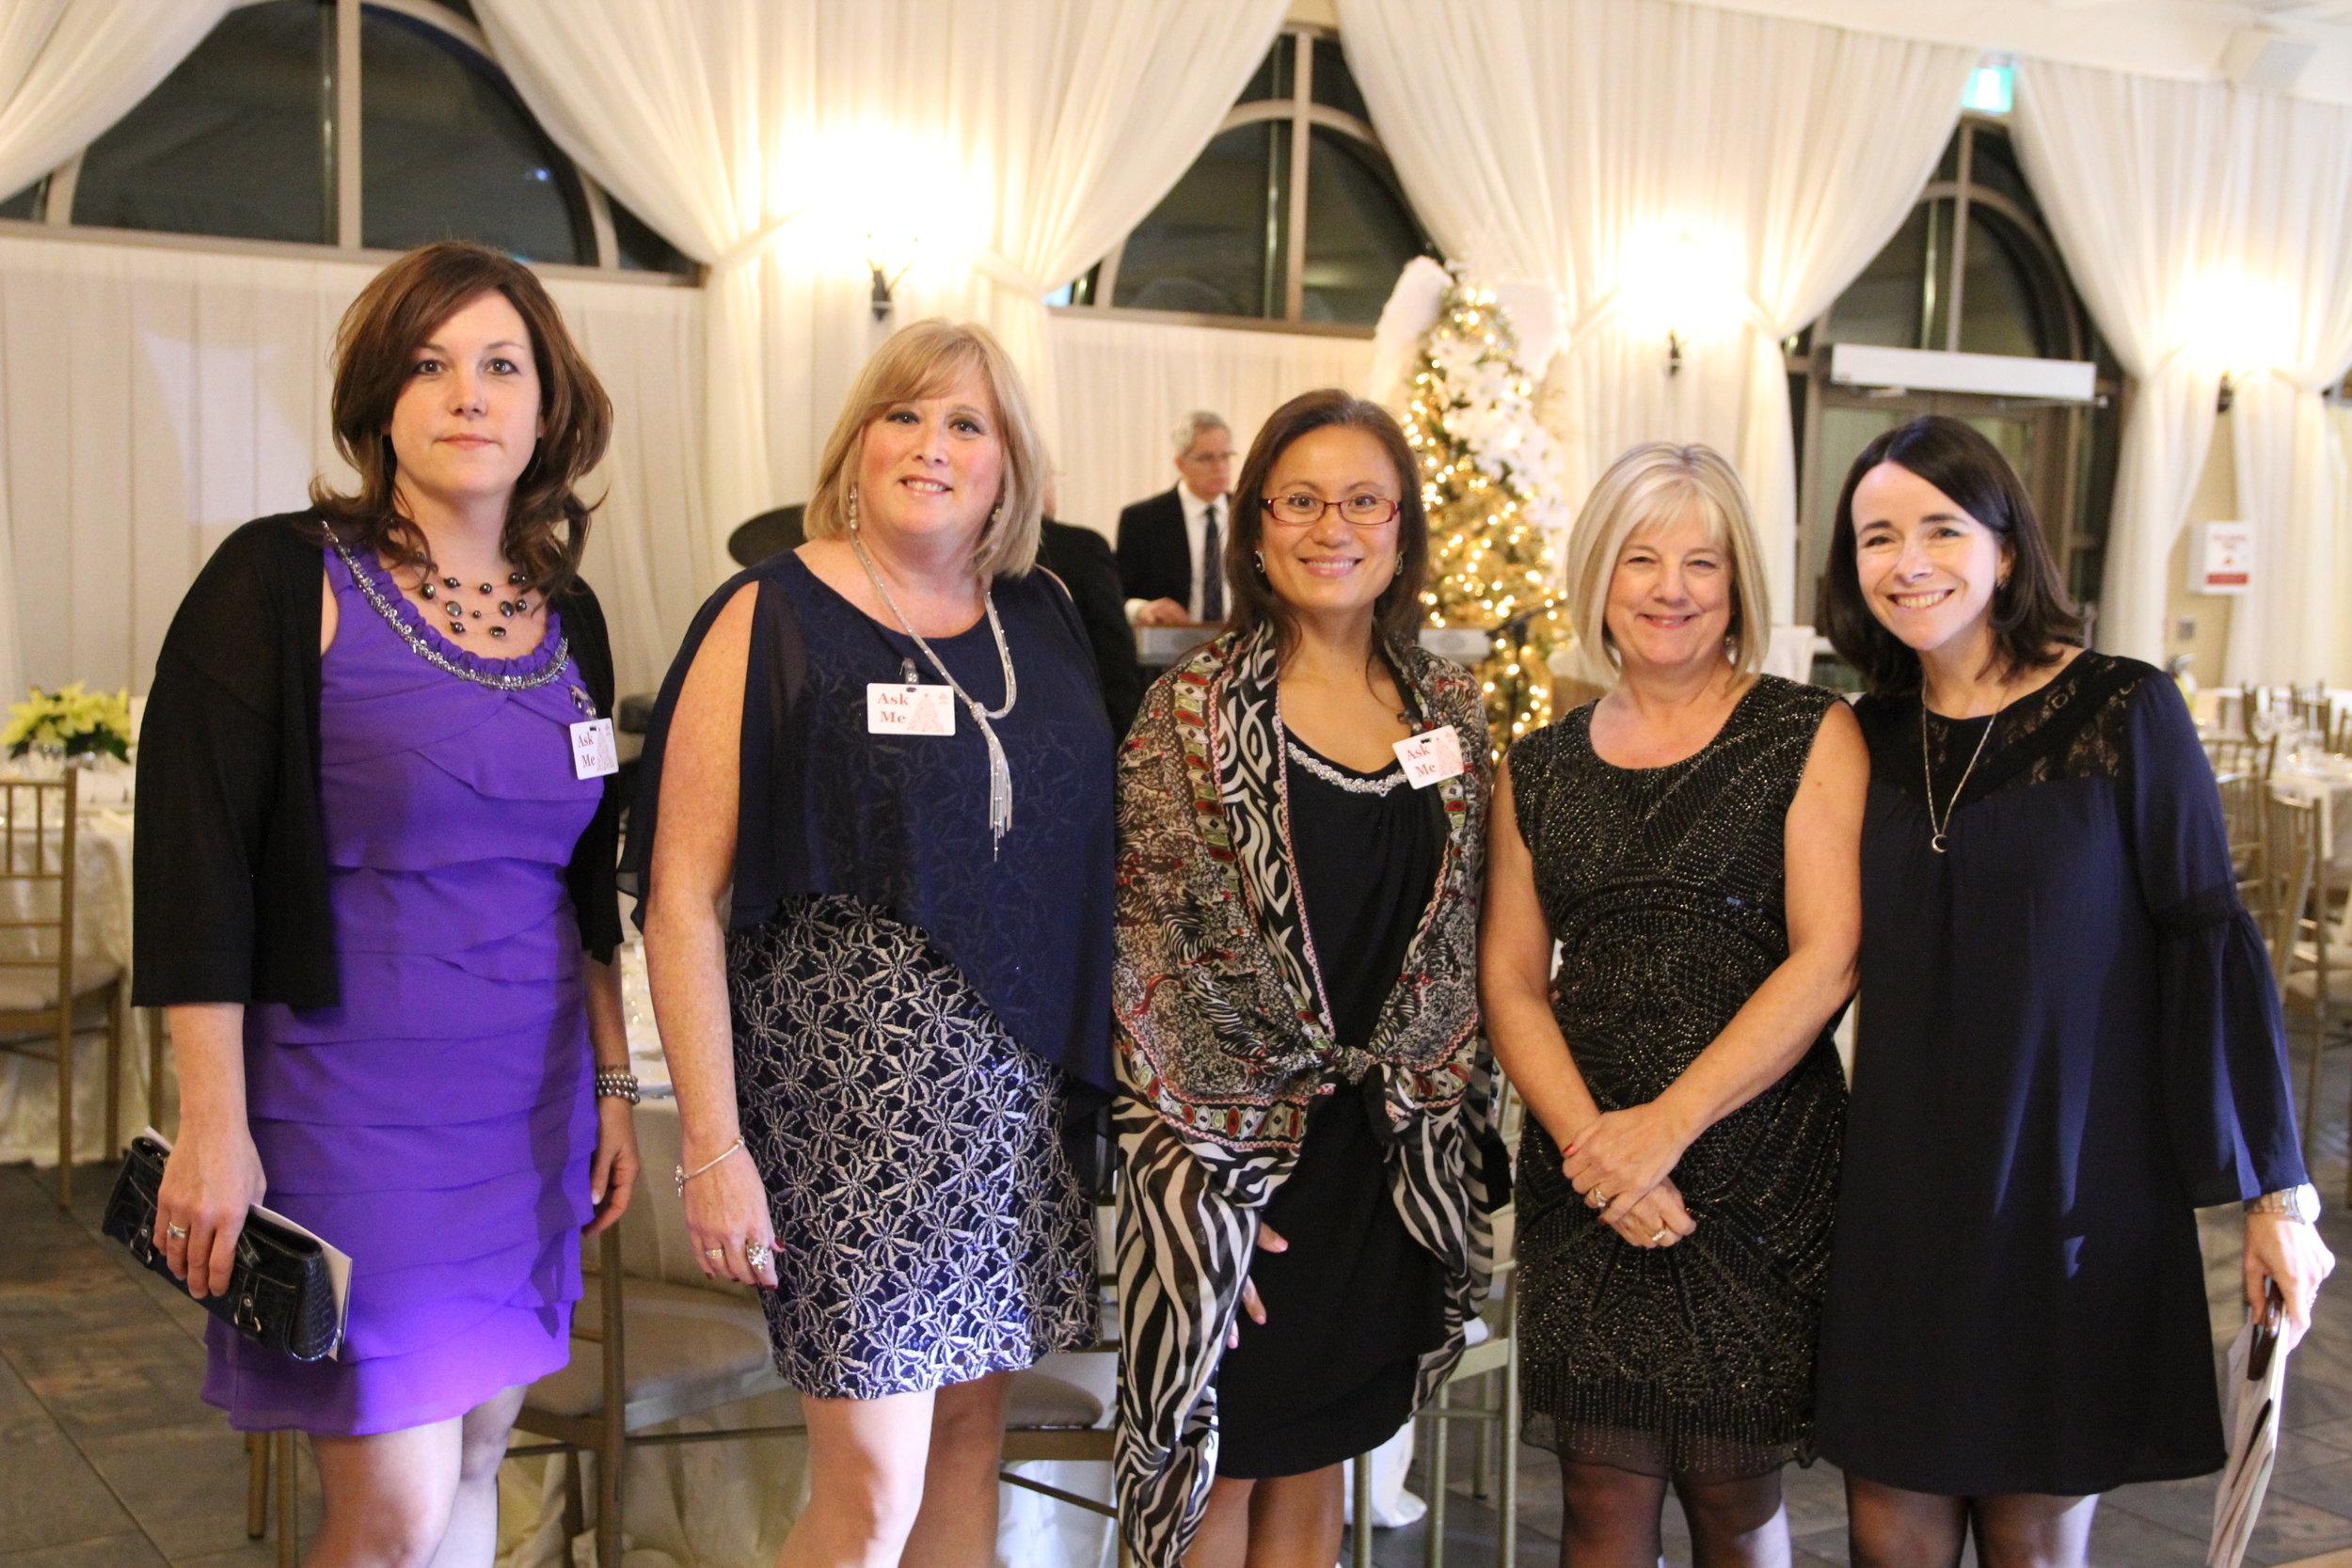 16 Michelle, Cathy, Geraldine, Lee, Shona.jpg